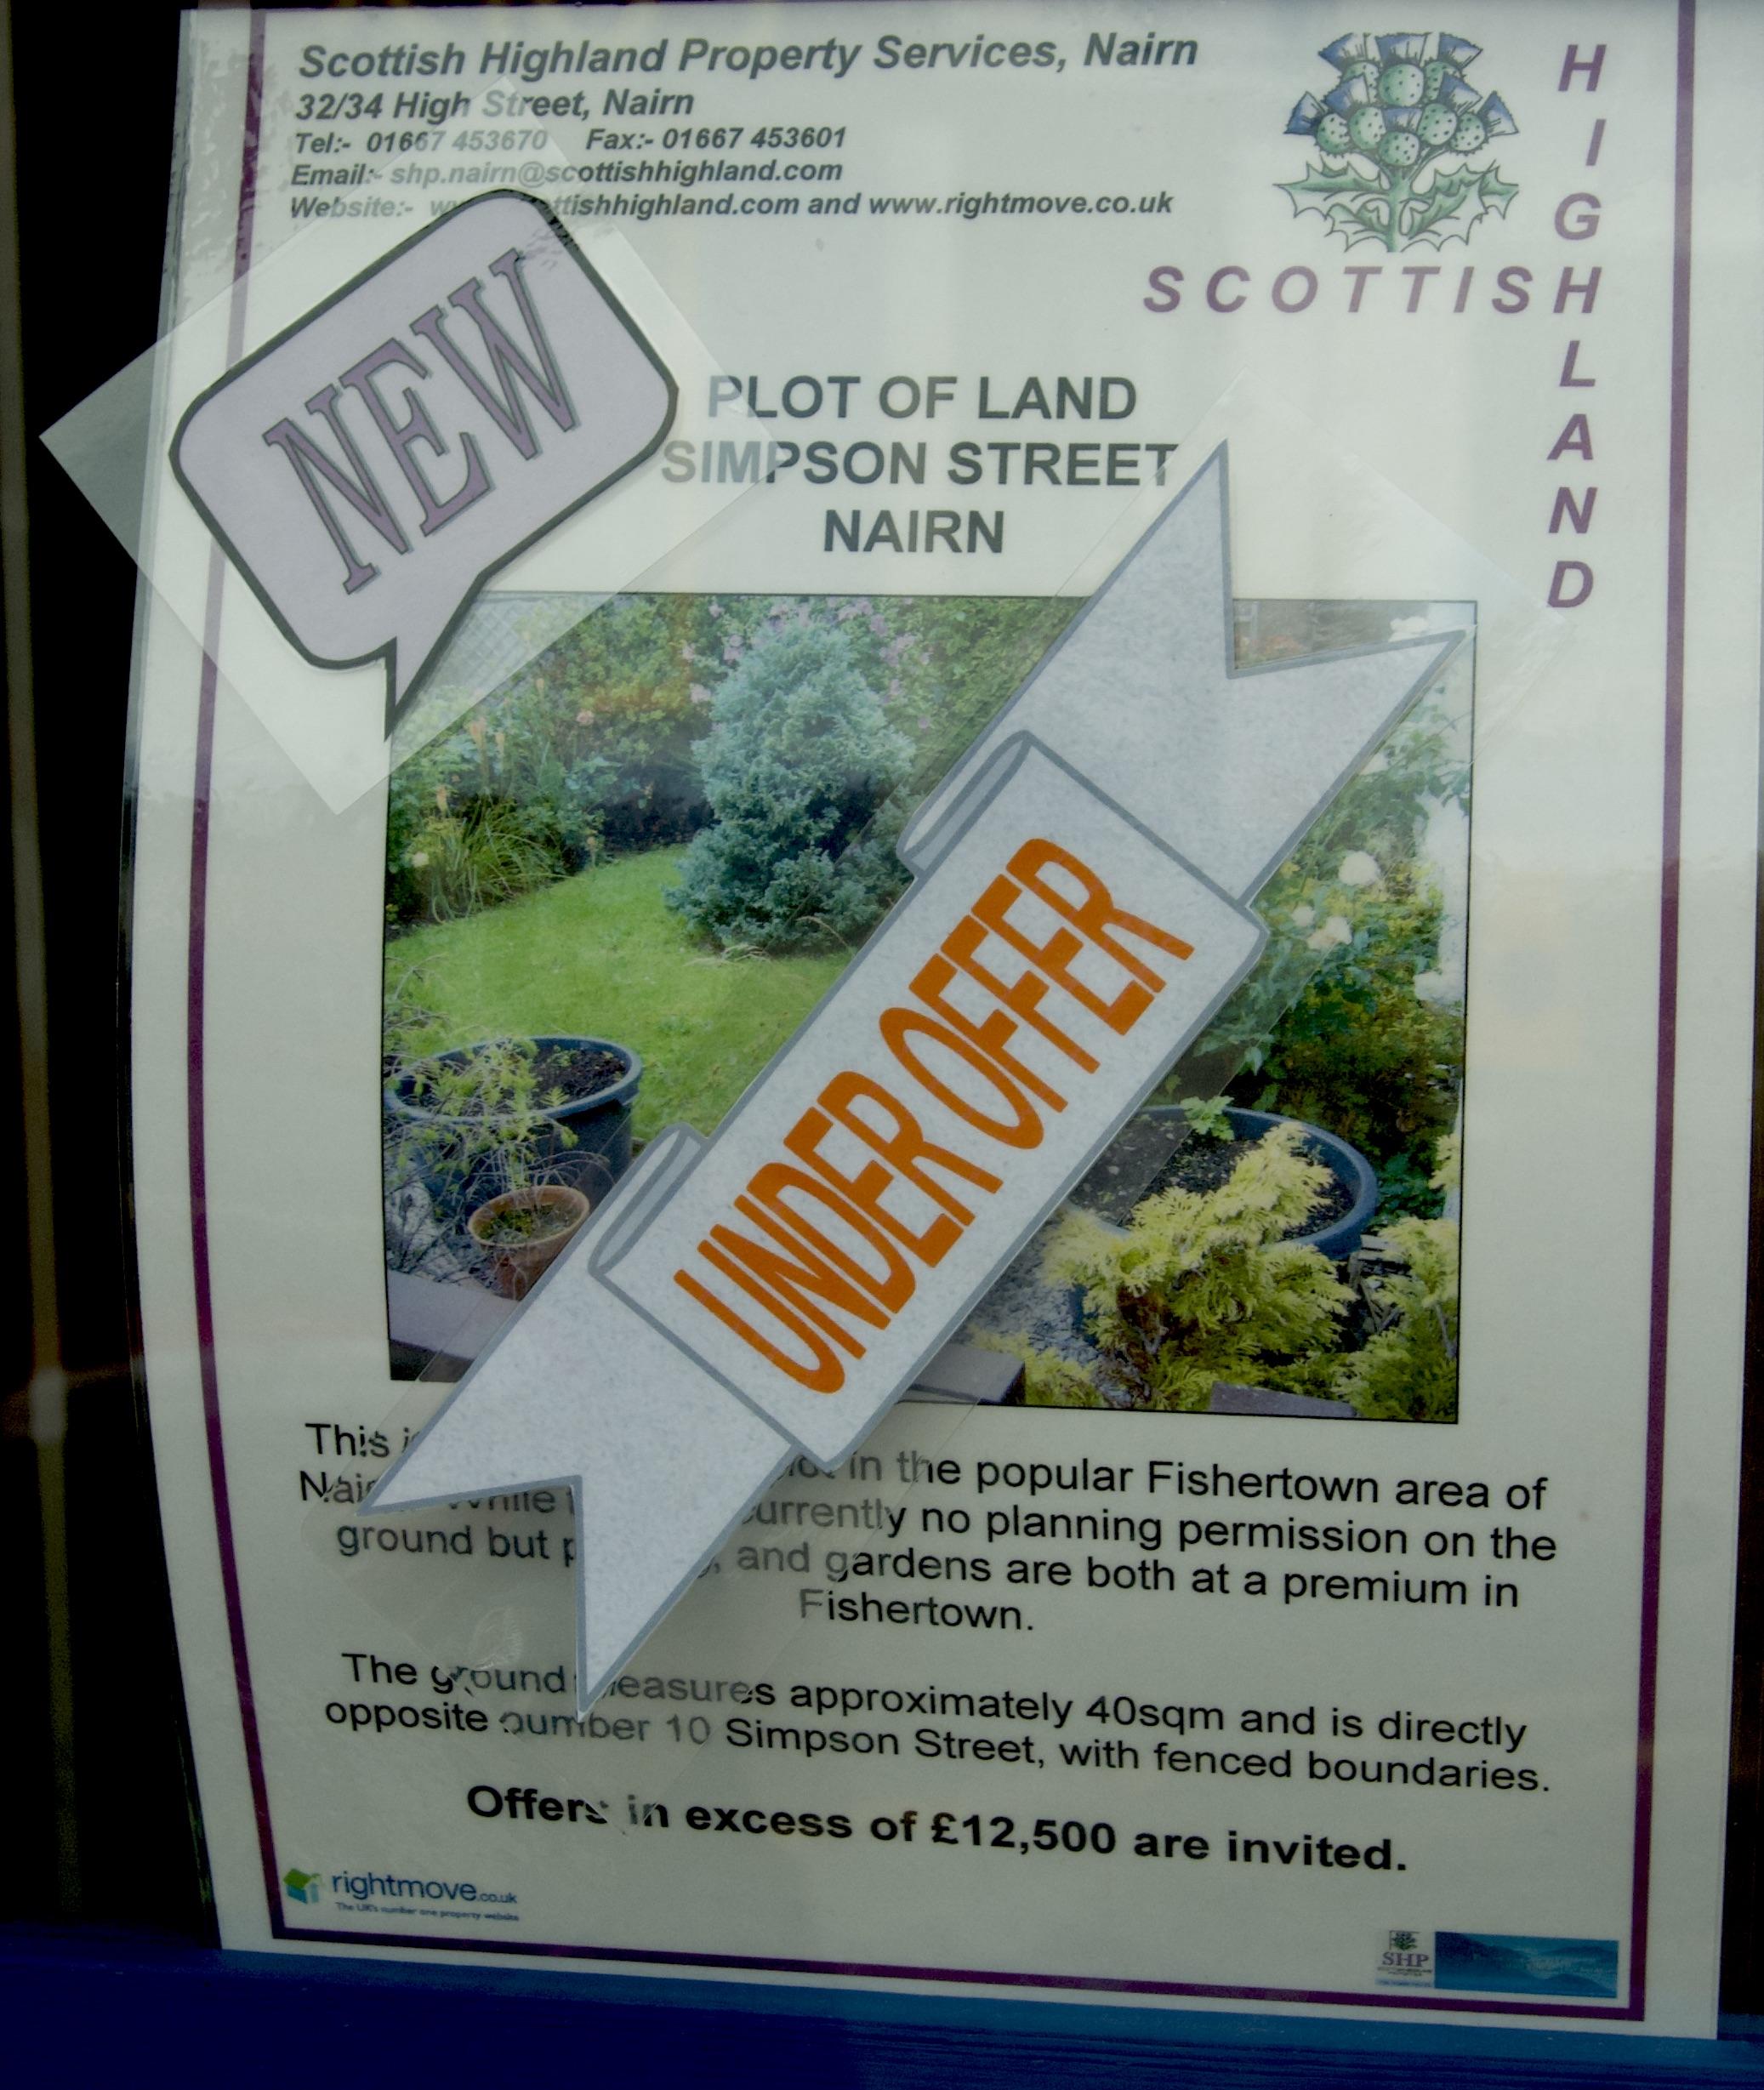 Nairn, Scotland: Car park plot under offer!